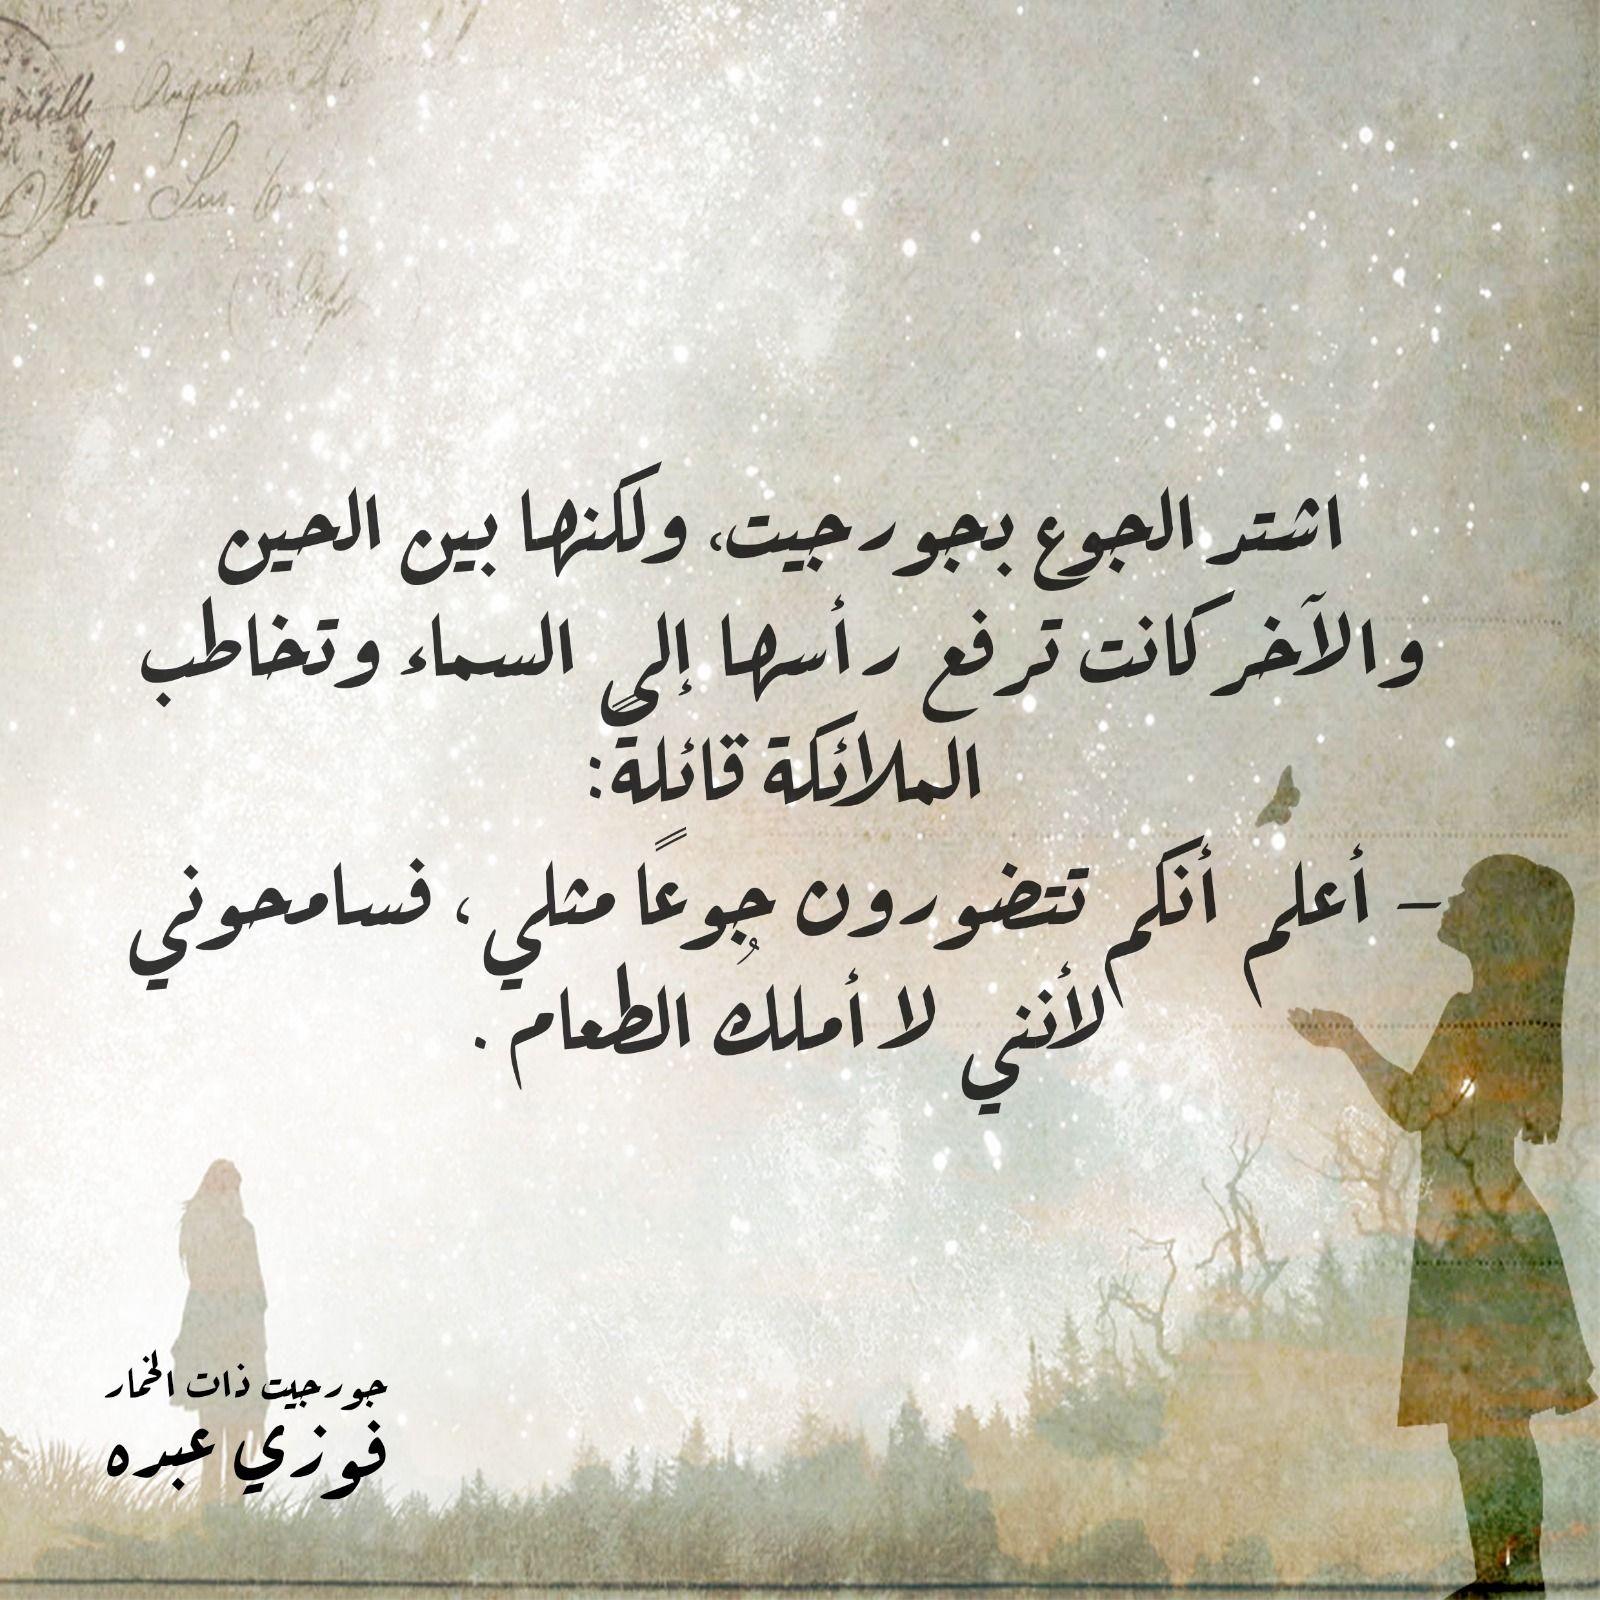 جورجيت ذات الخمار Arabic Calligraphy Calligraphy